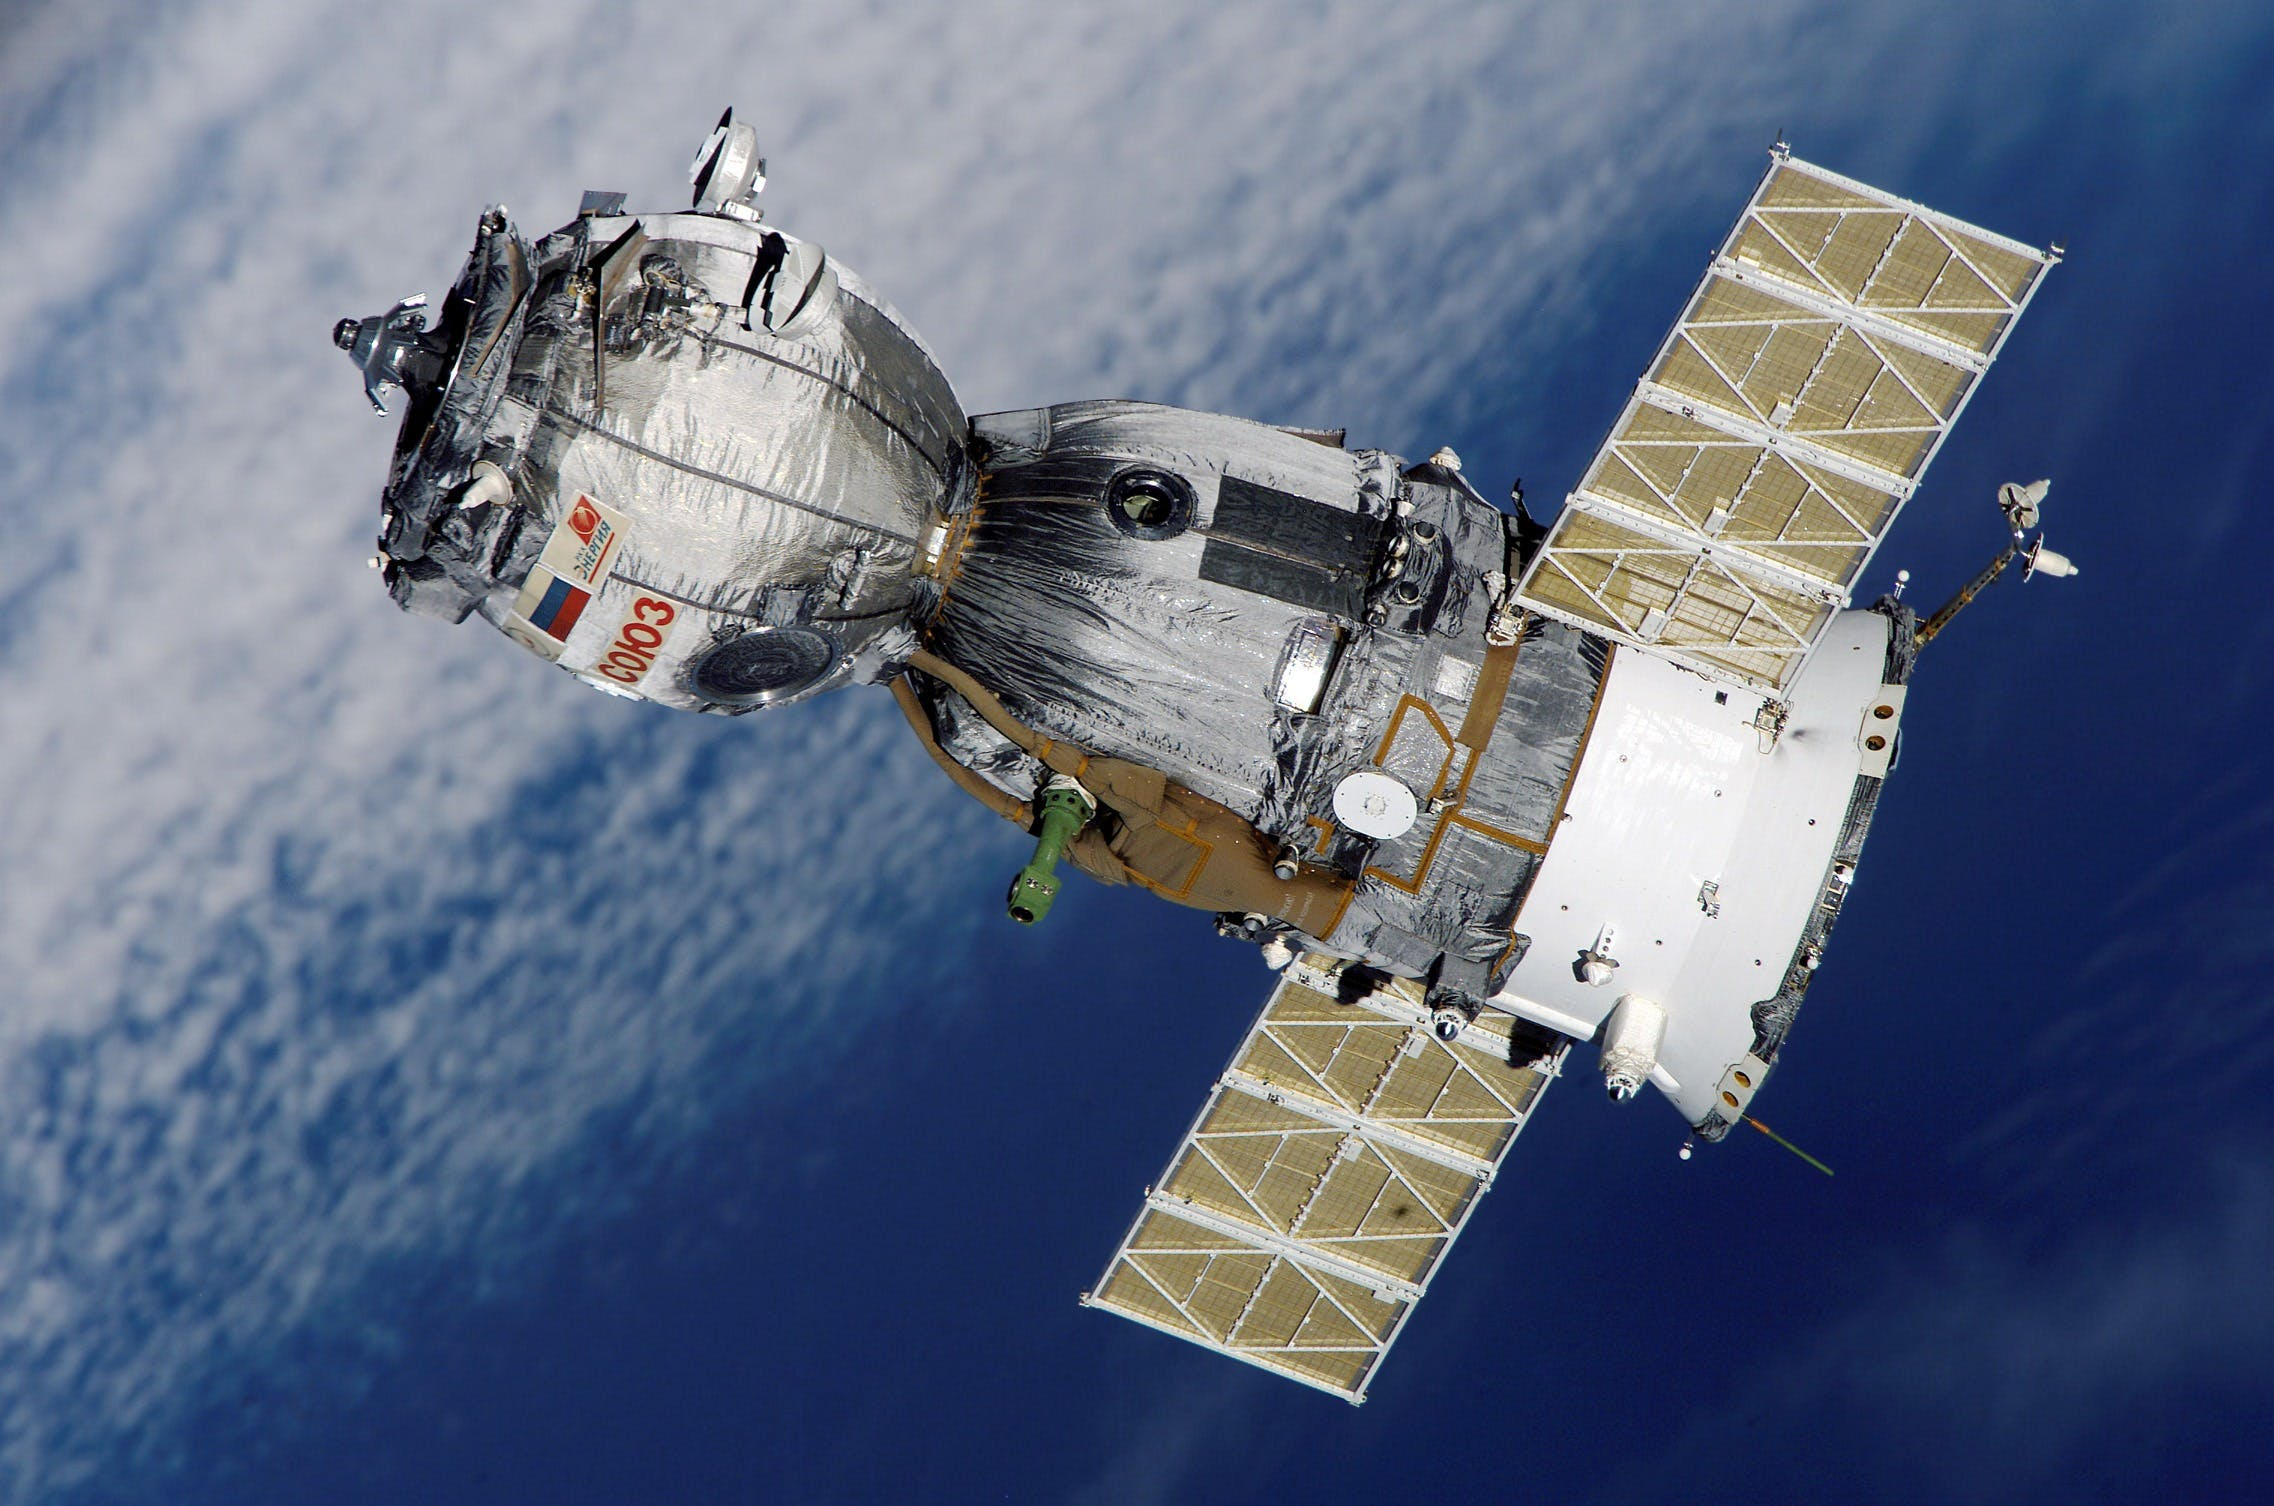 Kostenloses Stock Foto zu entdeckung, forschung, luftfahrt, orbit